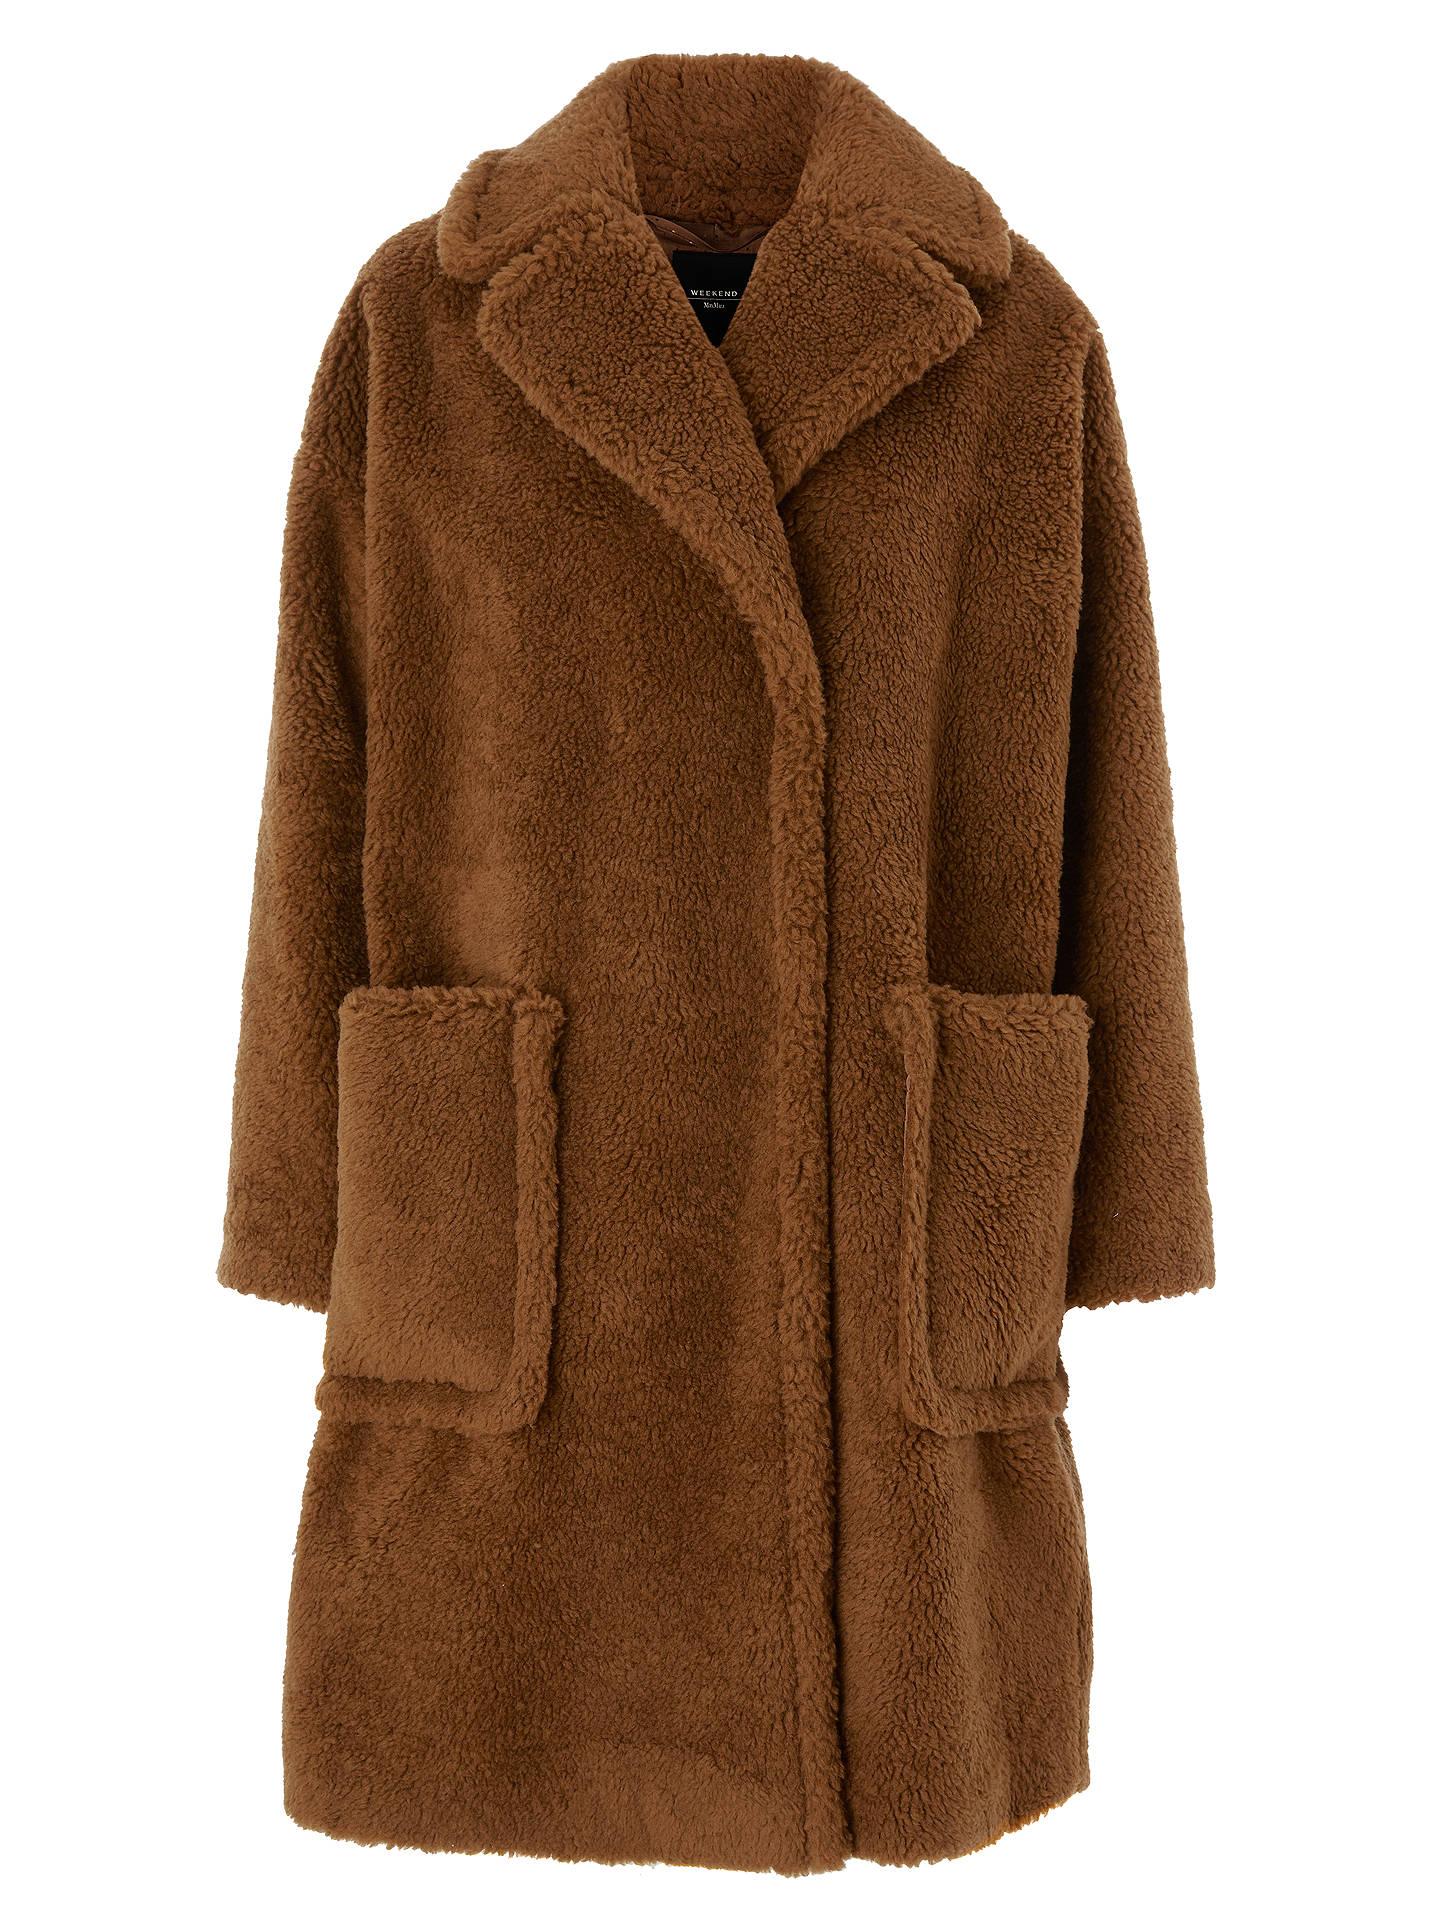 Weekend Maxmara At Reale Faux Teddy John Fur Caramel Lewis Coat UqWrUw4dB